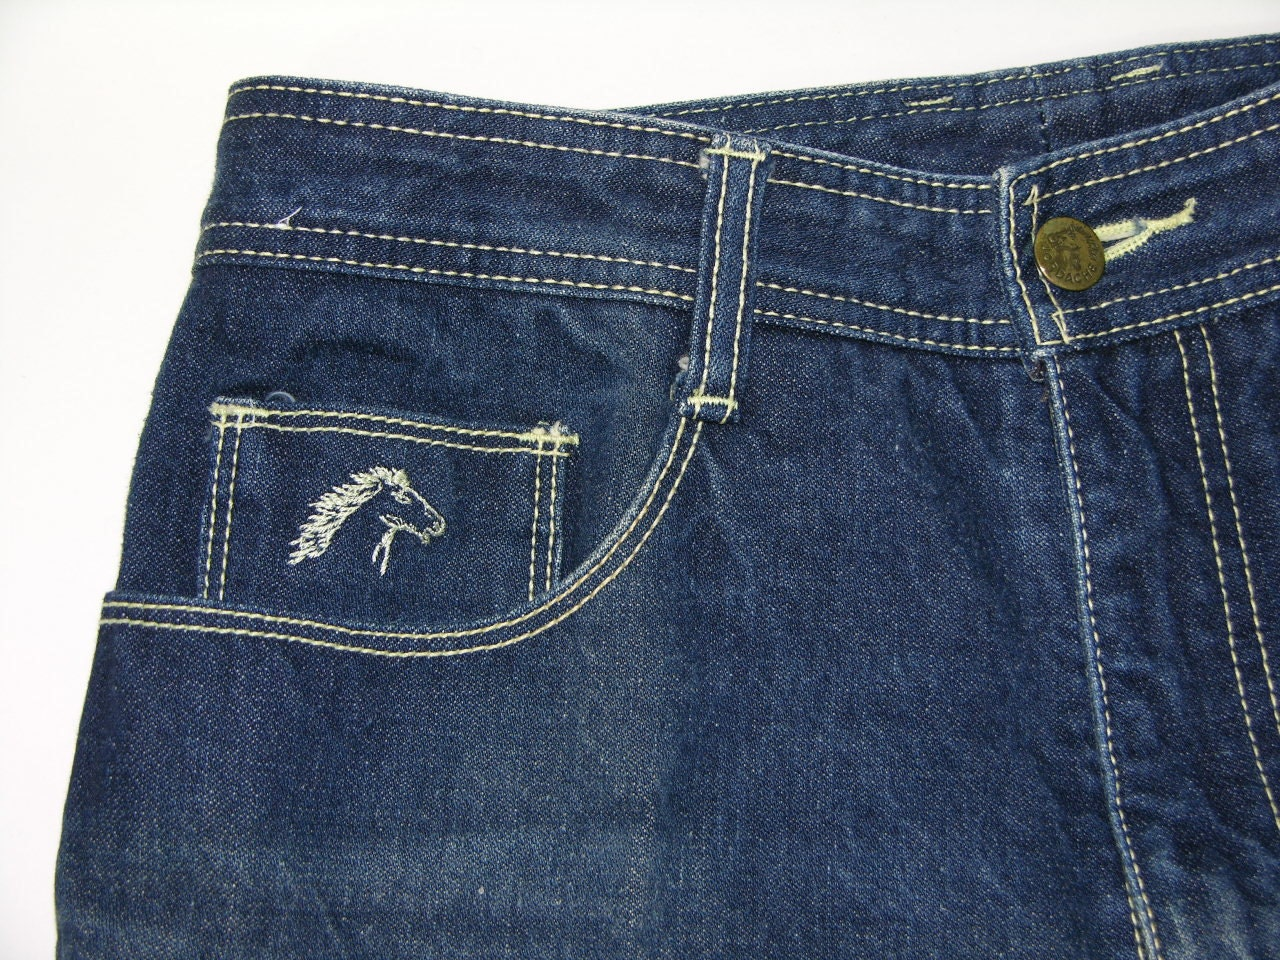 Vintage 1980u0026#39;s Menu0026#39;s JORDACHE jeans. Just starting by StyleStash